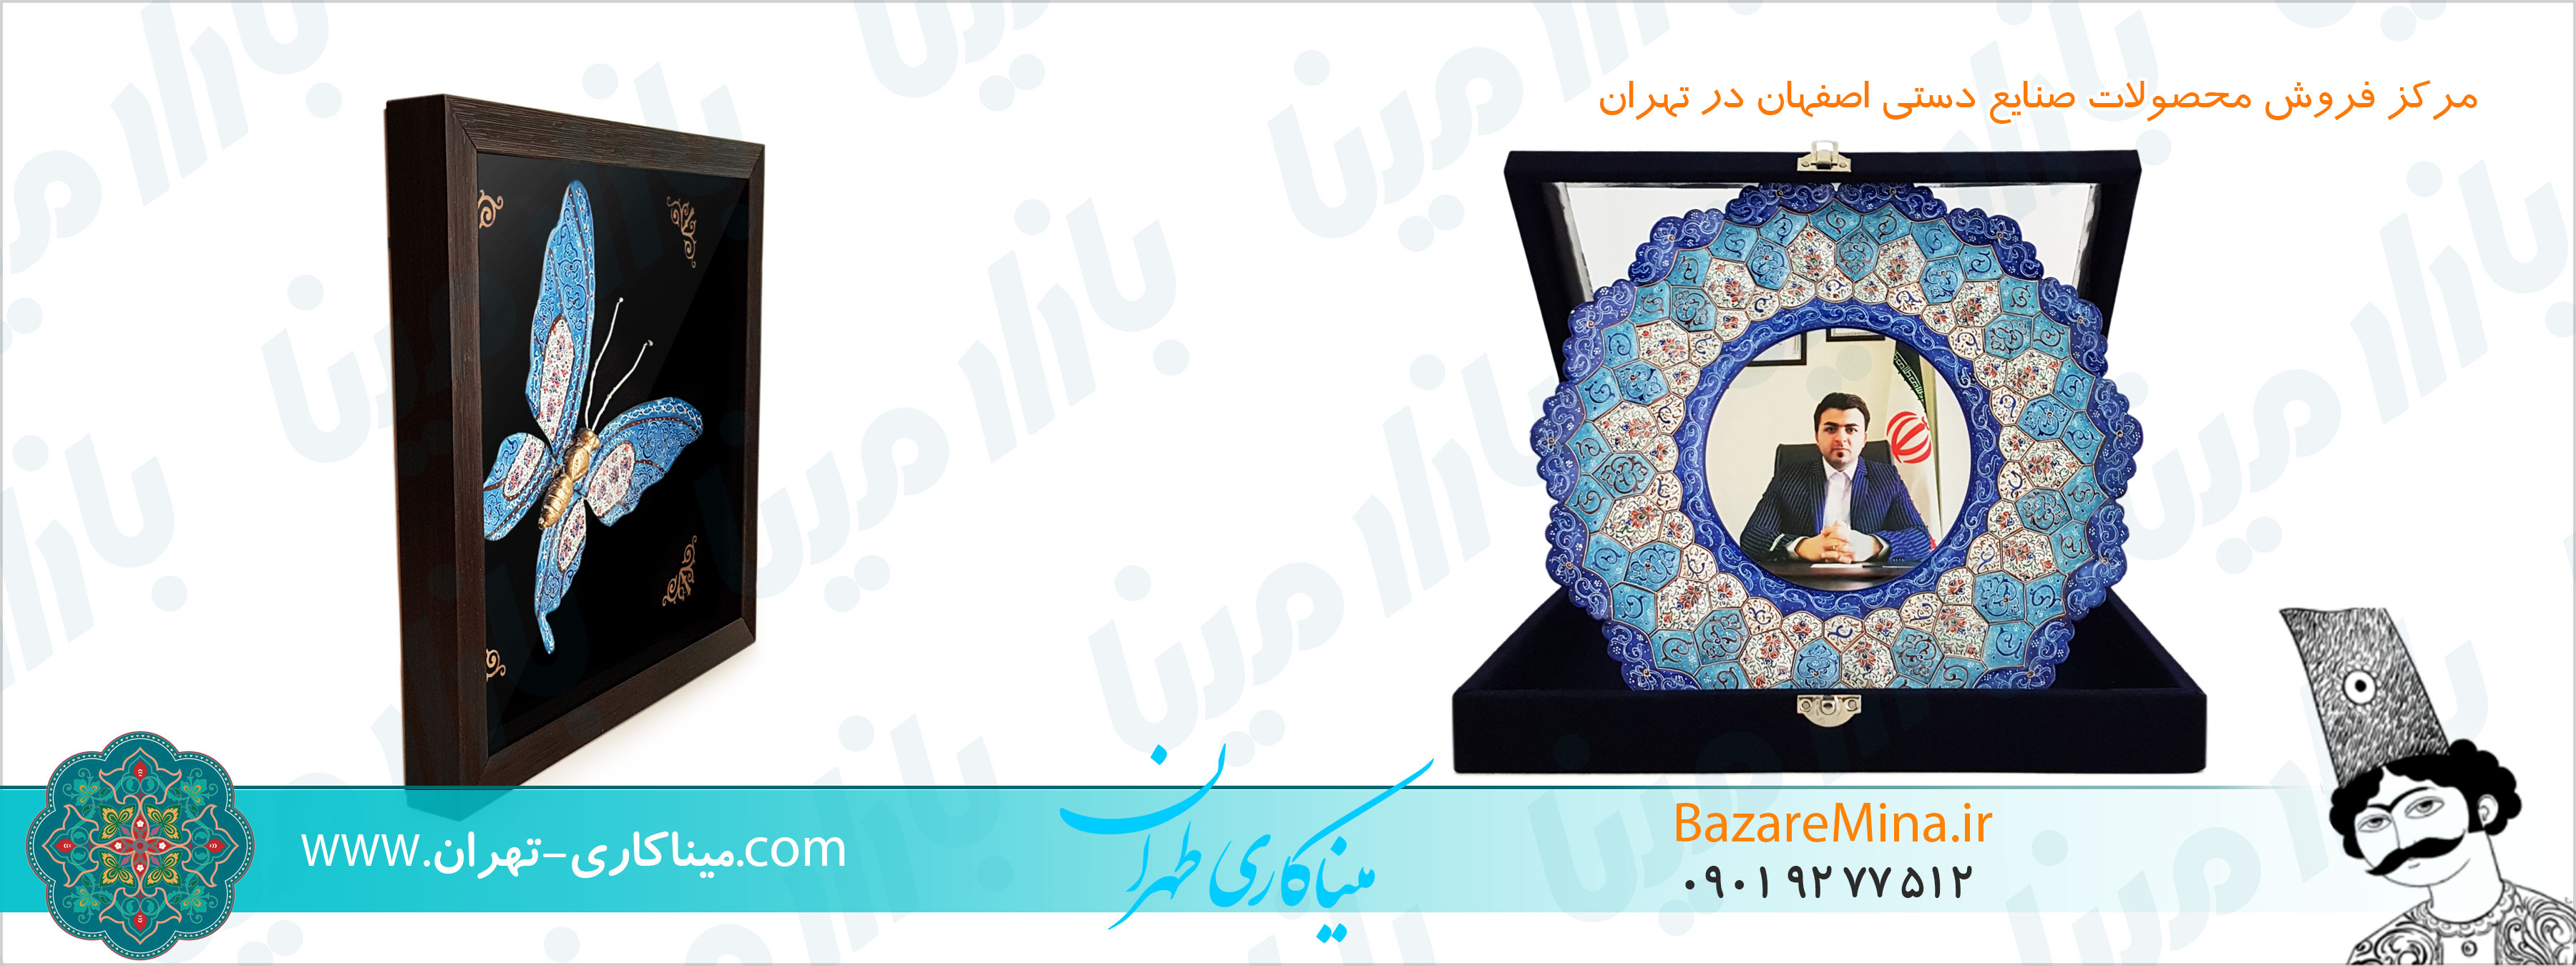 میناکاری فروش تهران